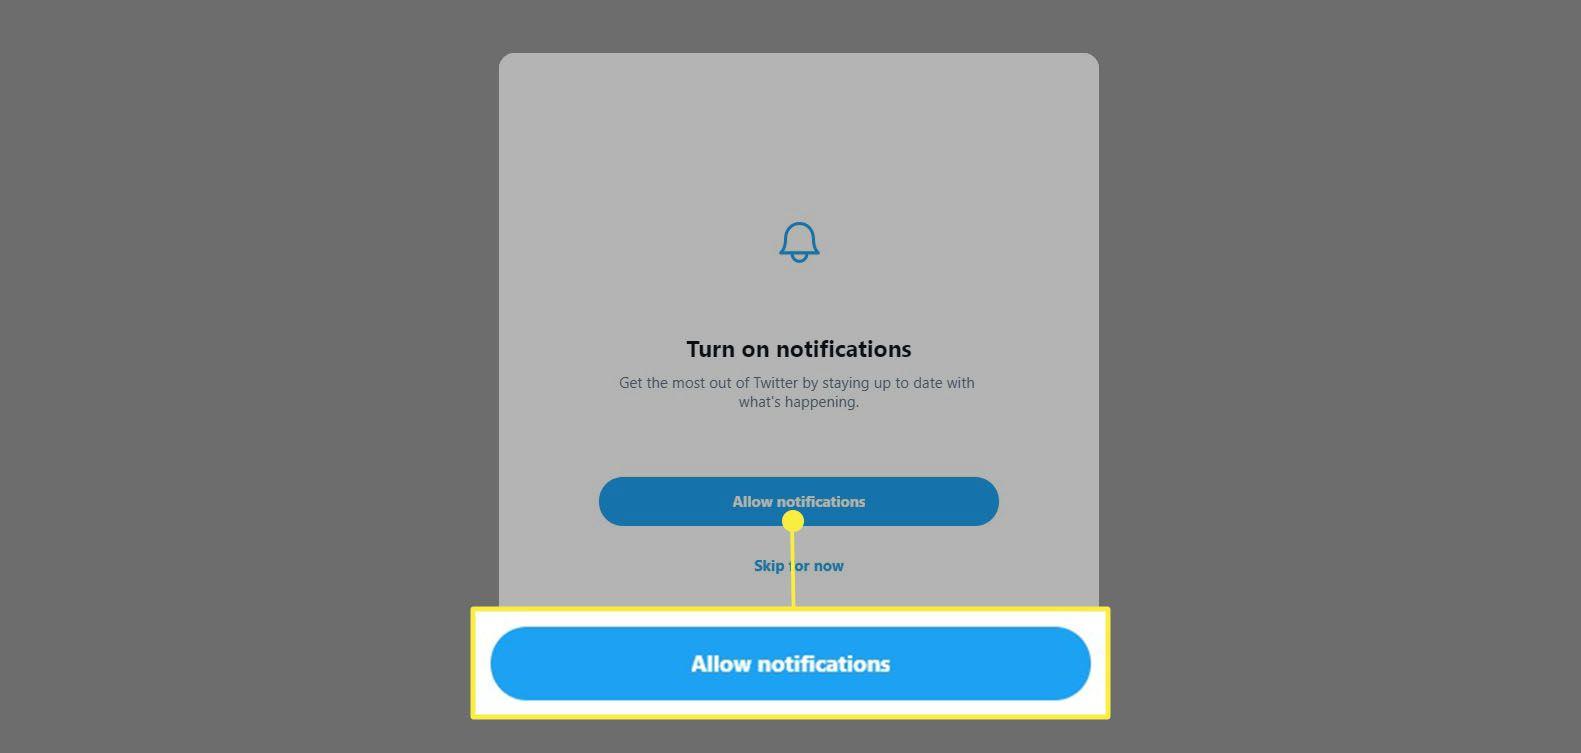 Twitter - Turn on notifications